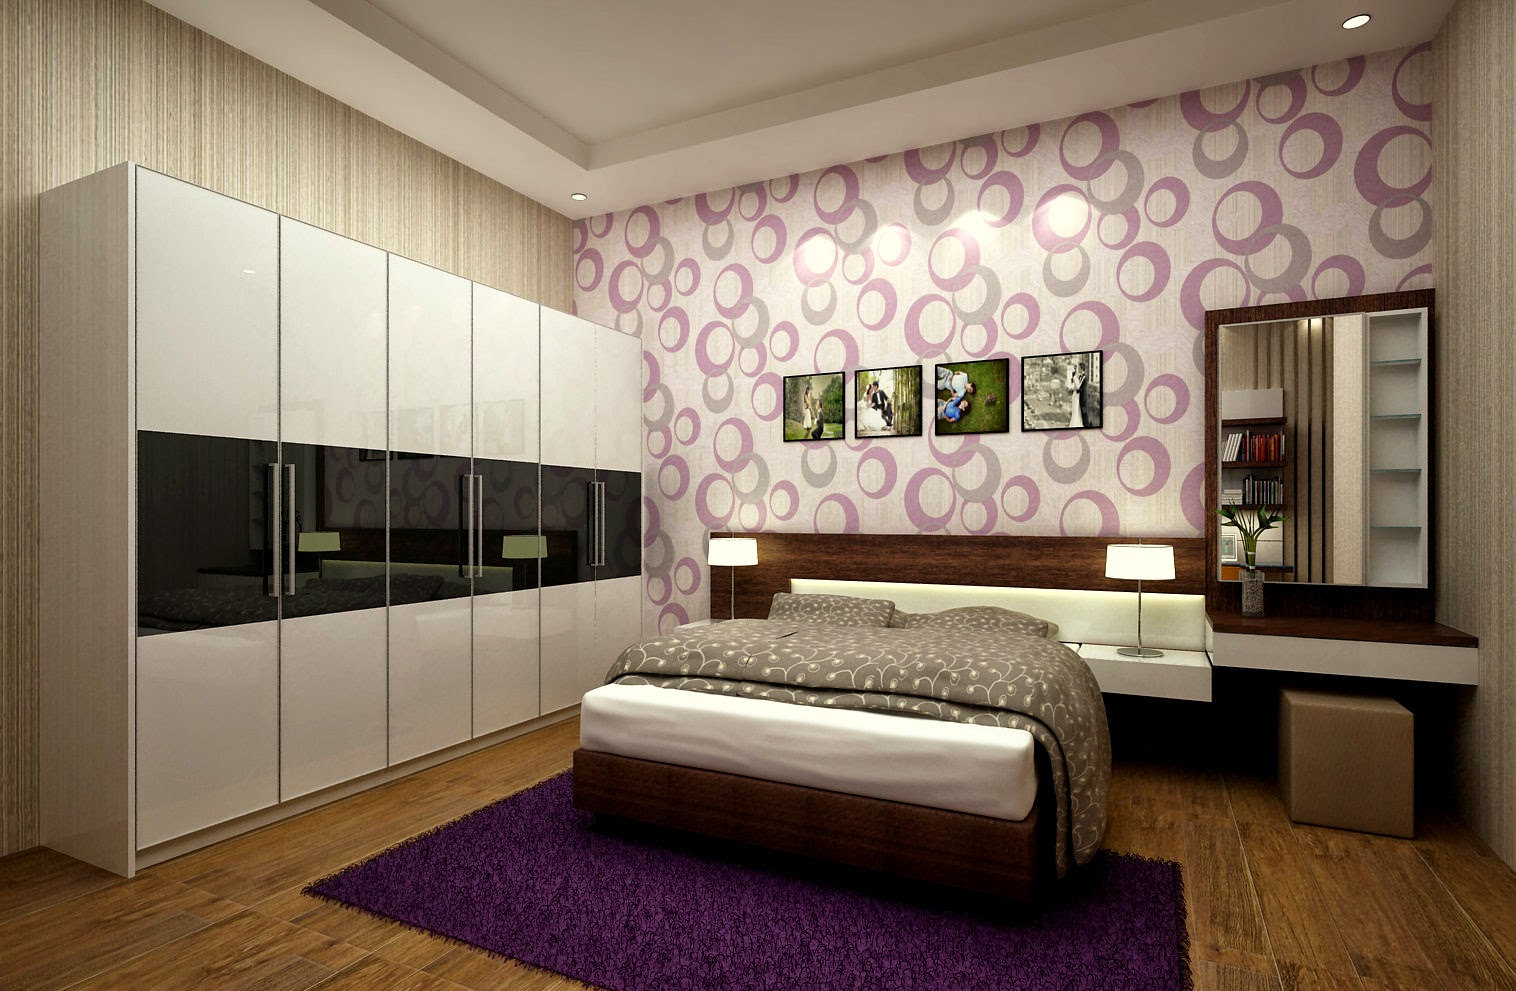 Design interior kamar minimalis - Design Kamar Set Minimalis